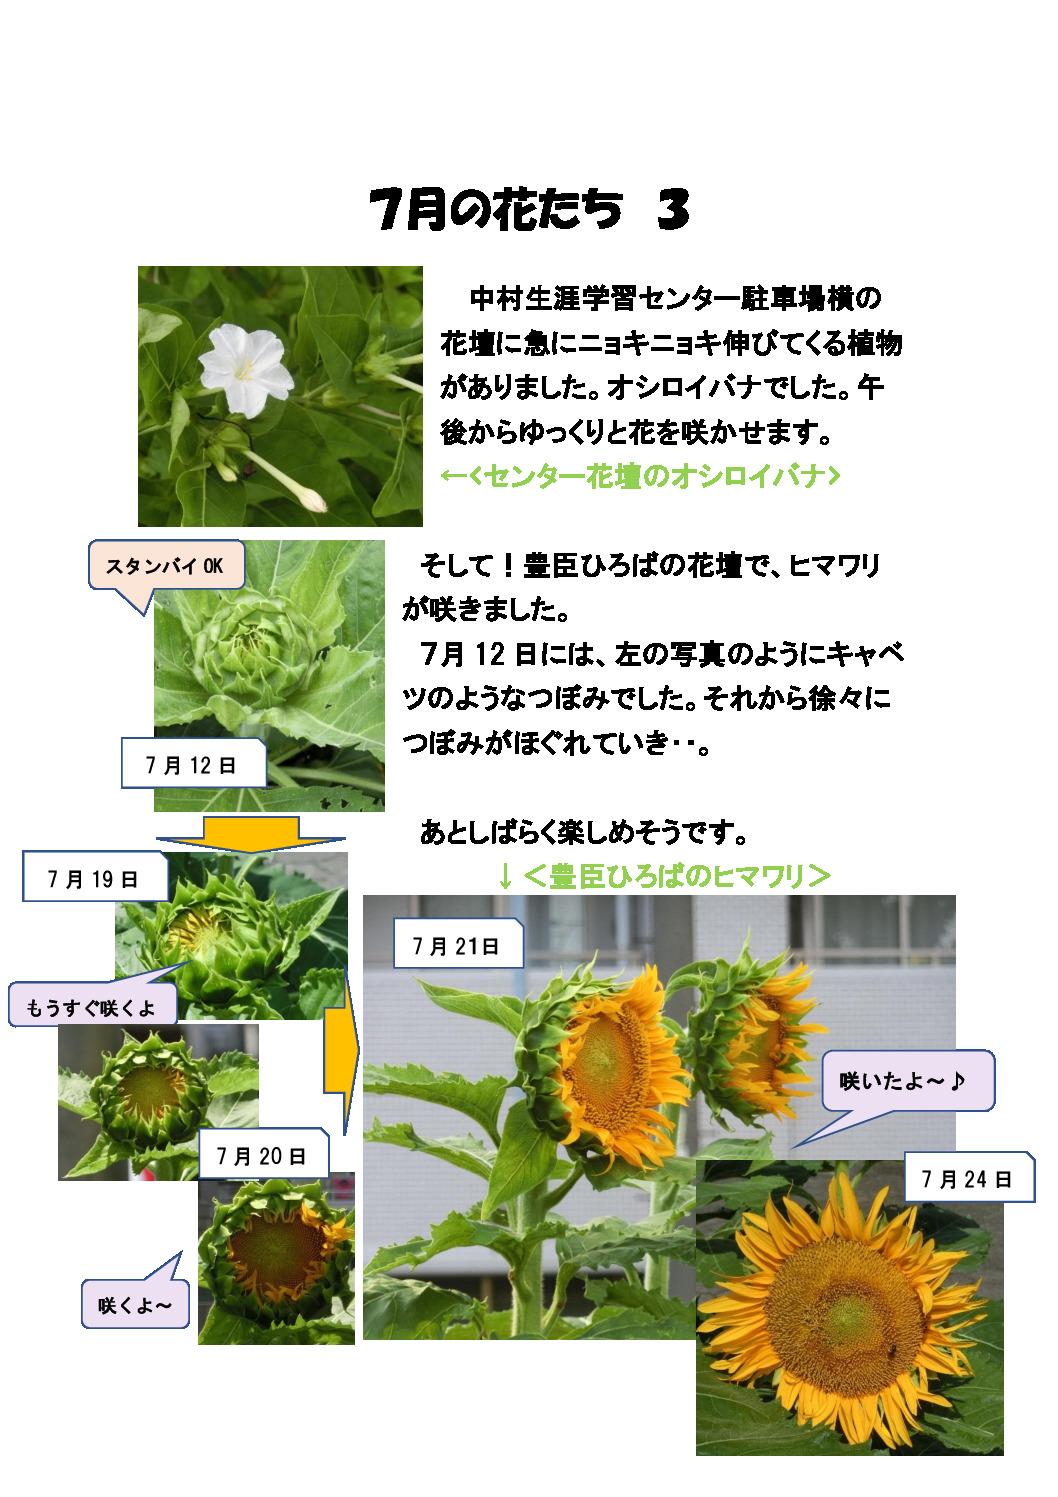 thumbnail of 7月の花たち3